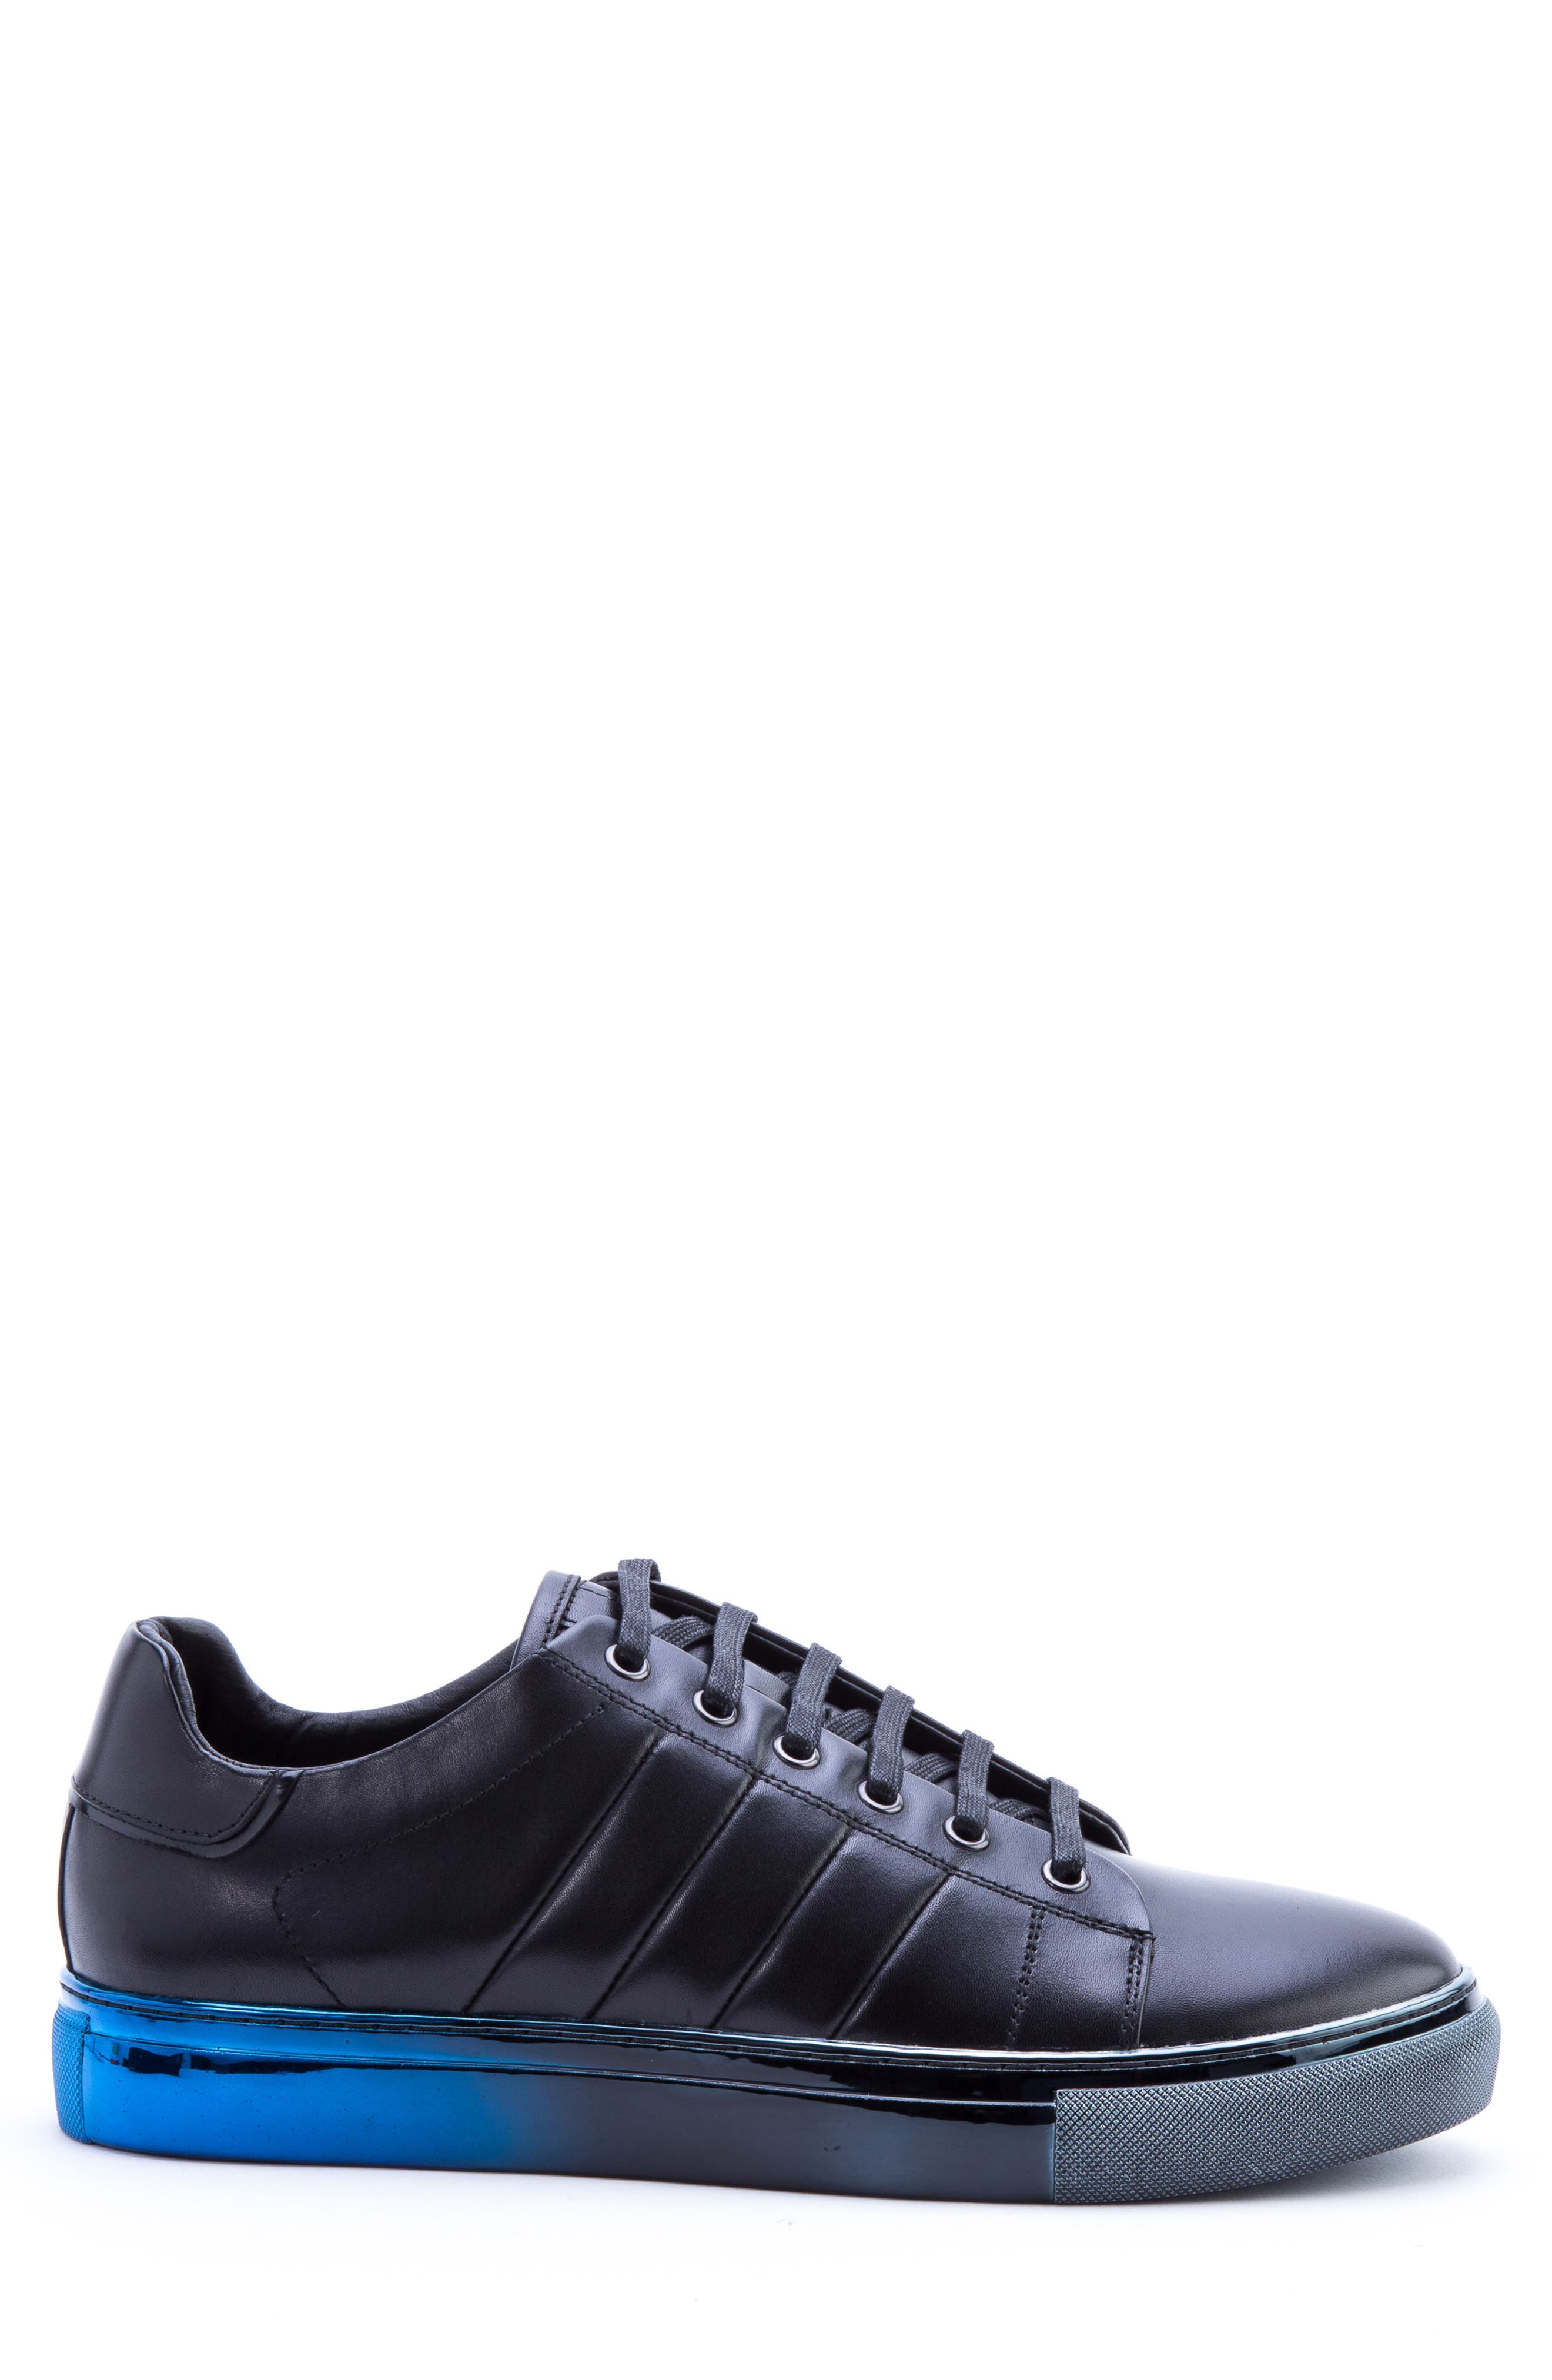 Brando Sneaker,                             Alternate thumbnail 3, color,                             BLACK LEATHER